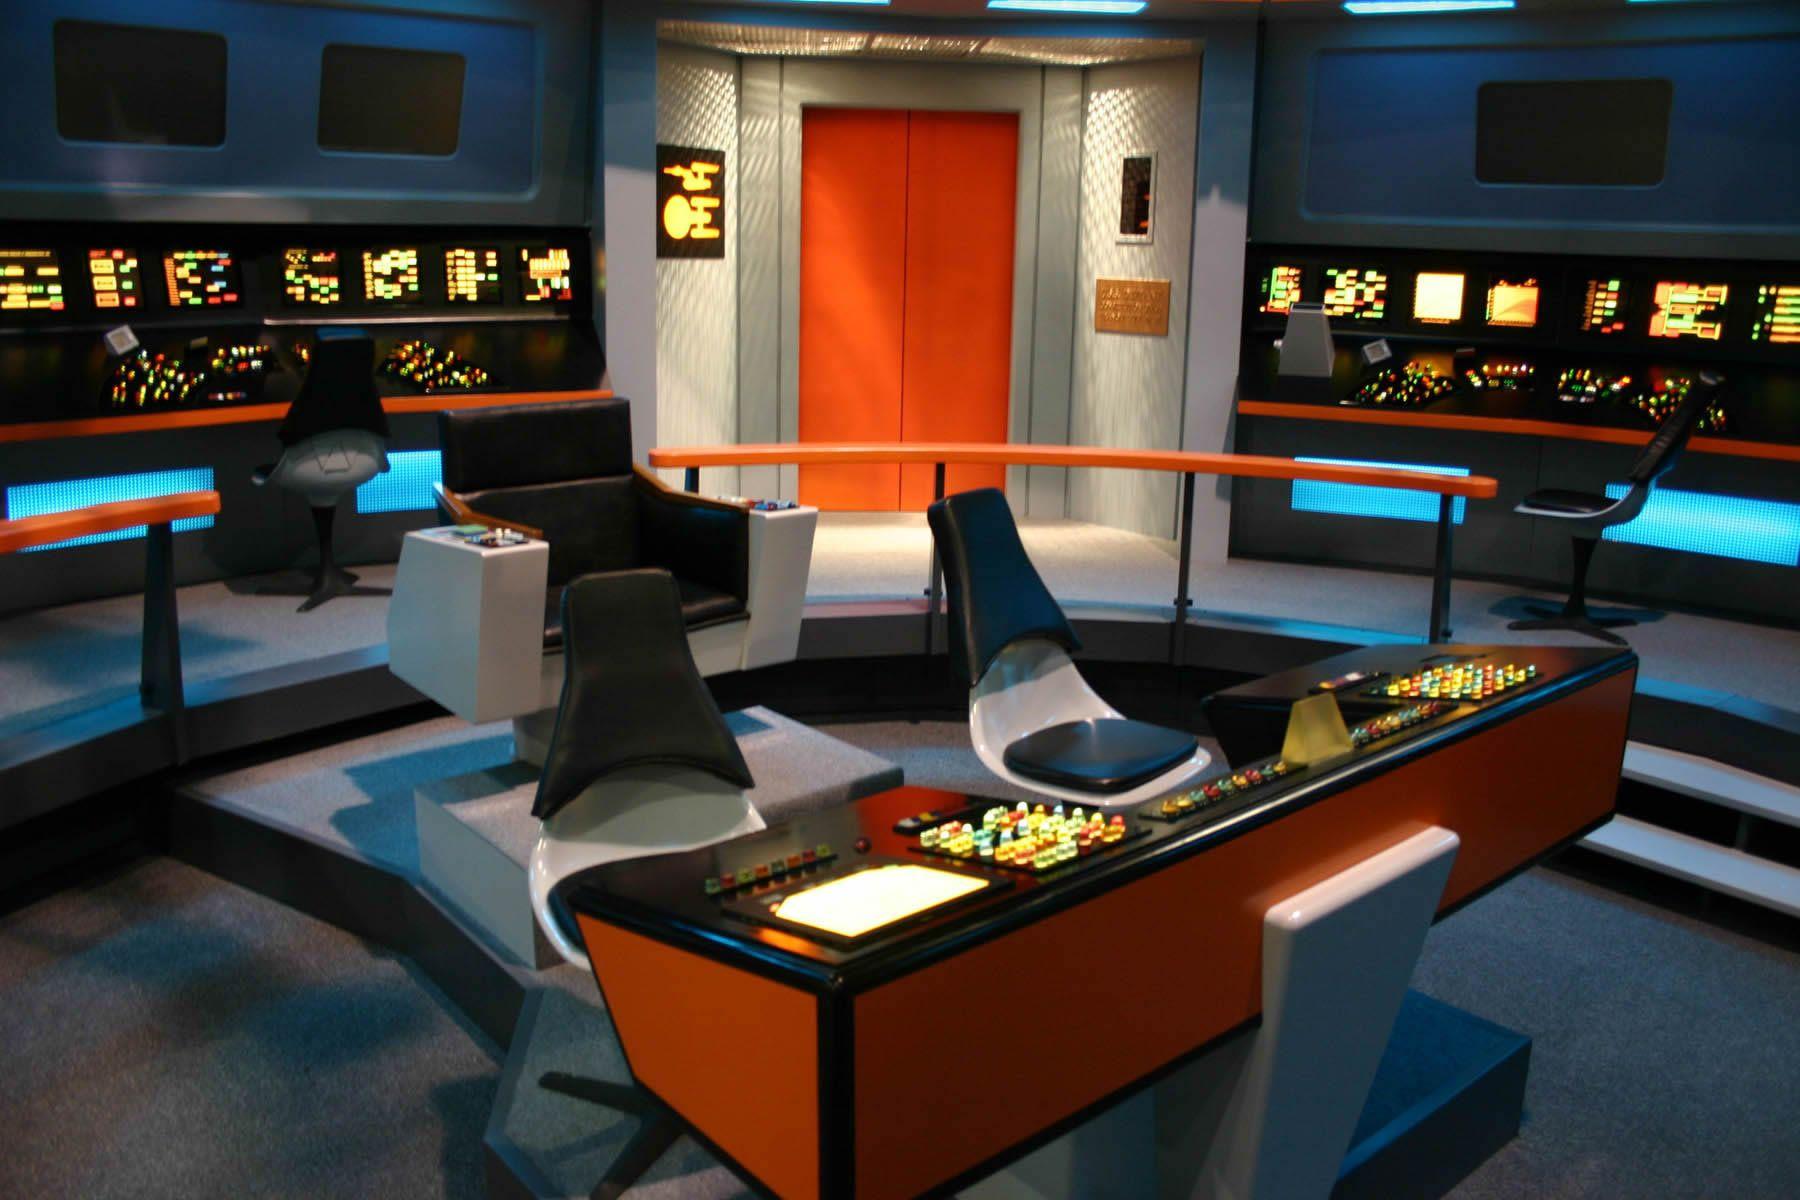 Get your own Star Trek email address USS Enterprise 1701 Email